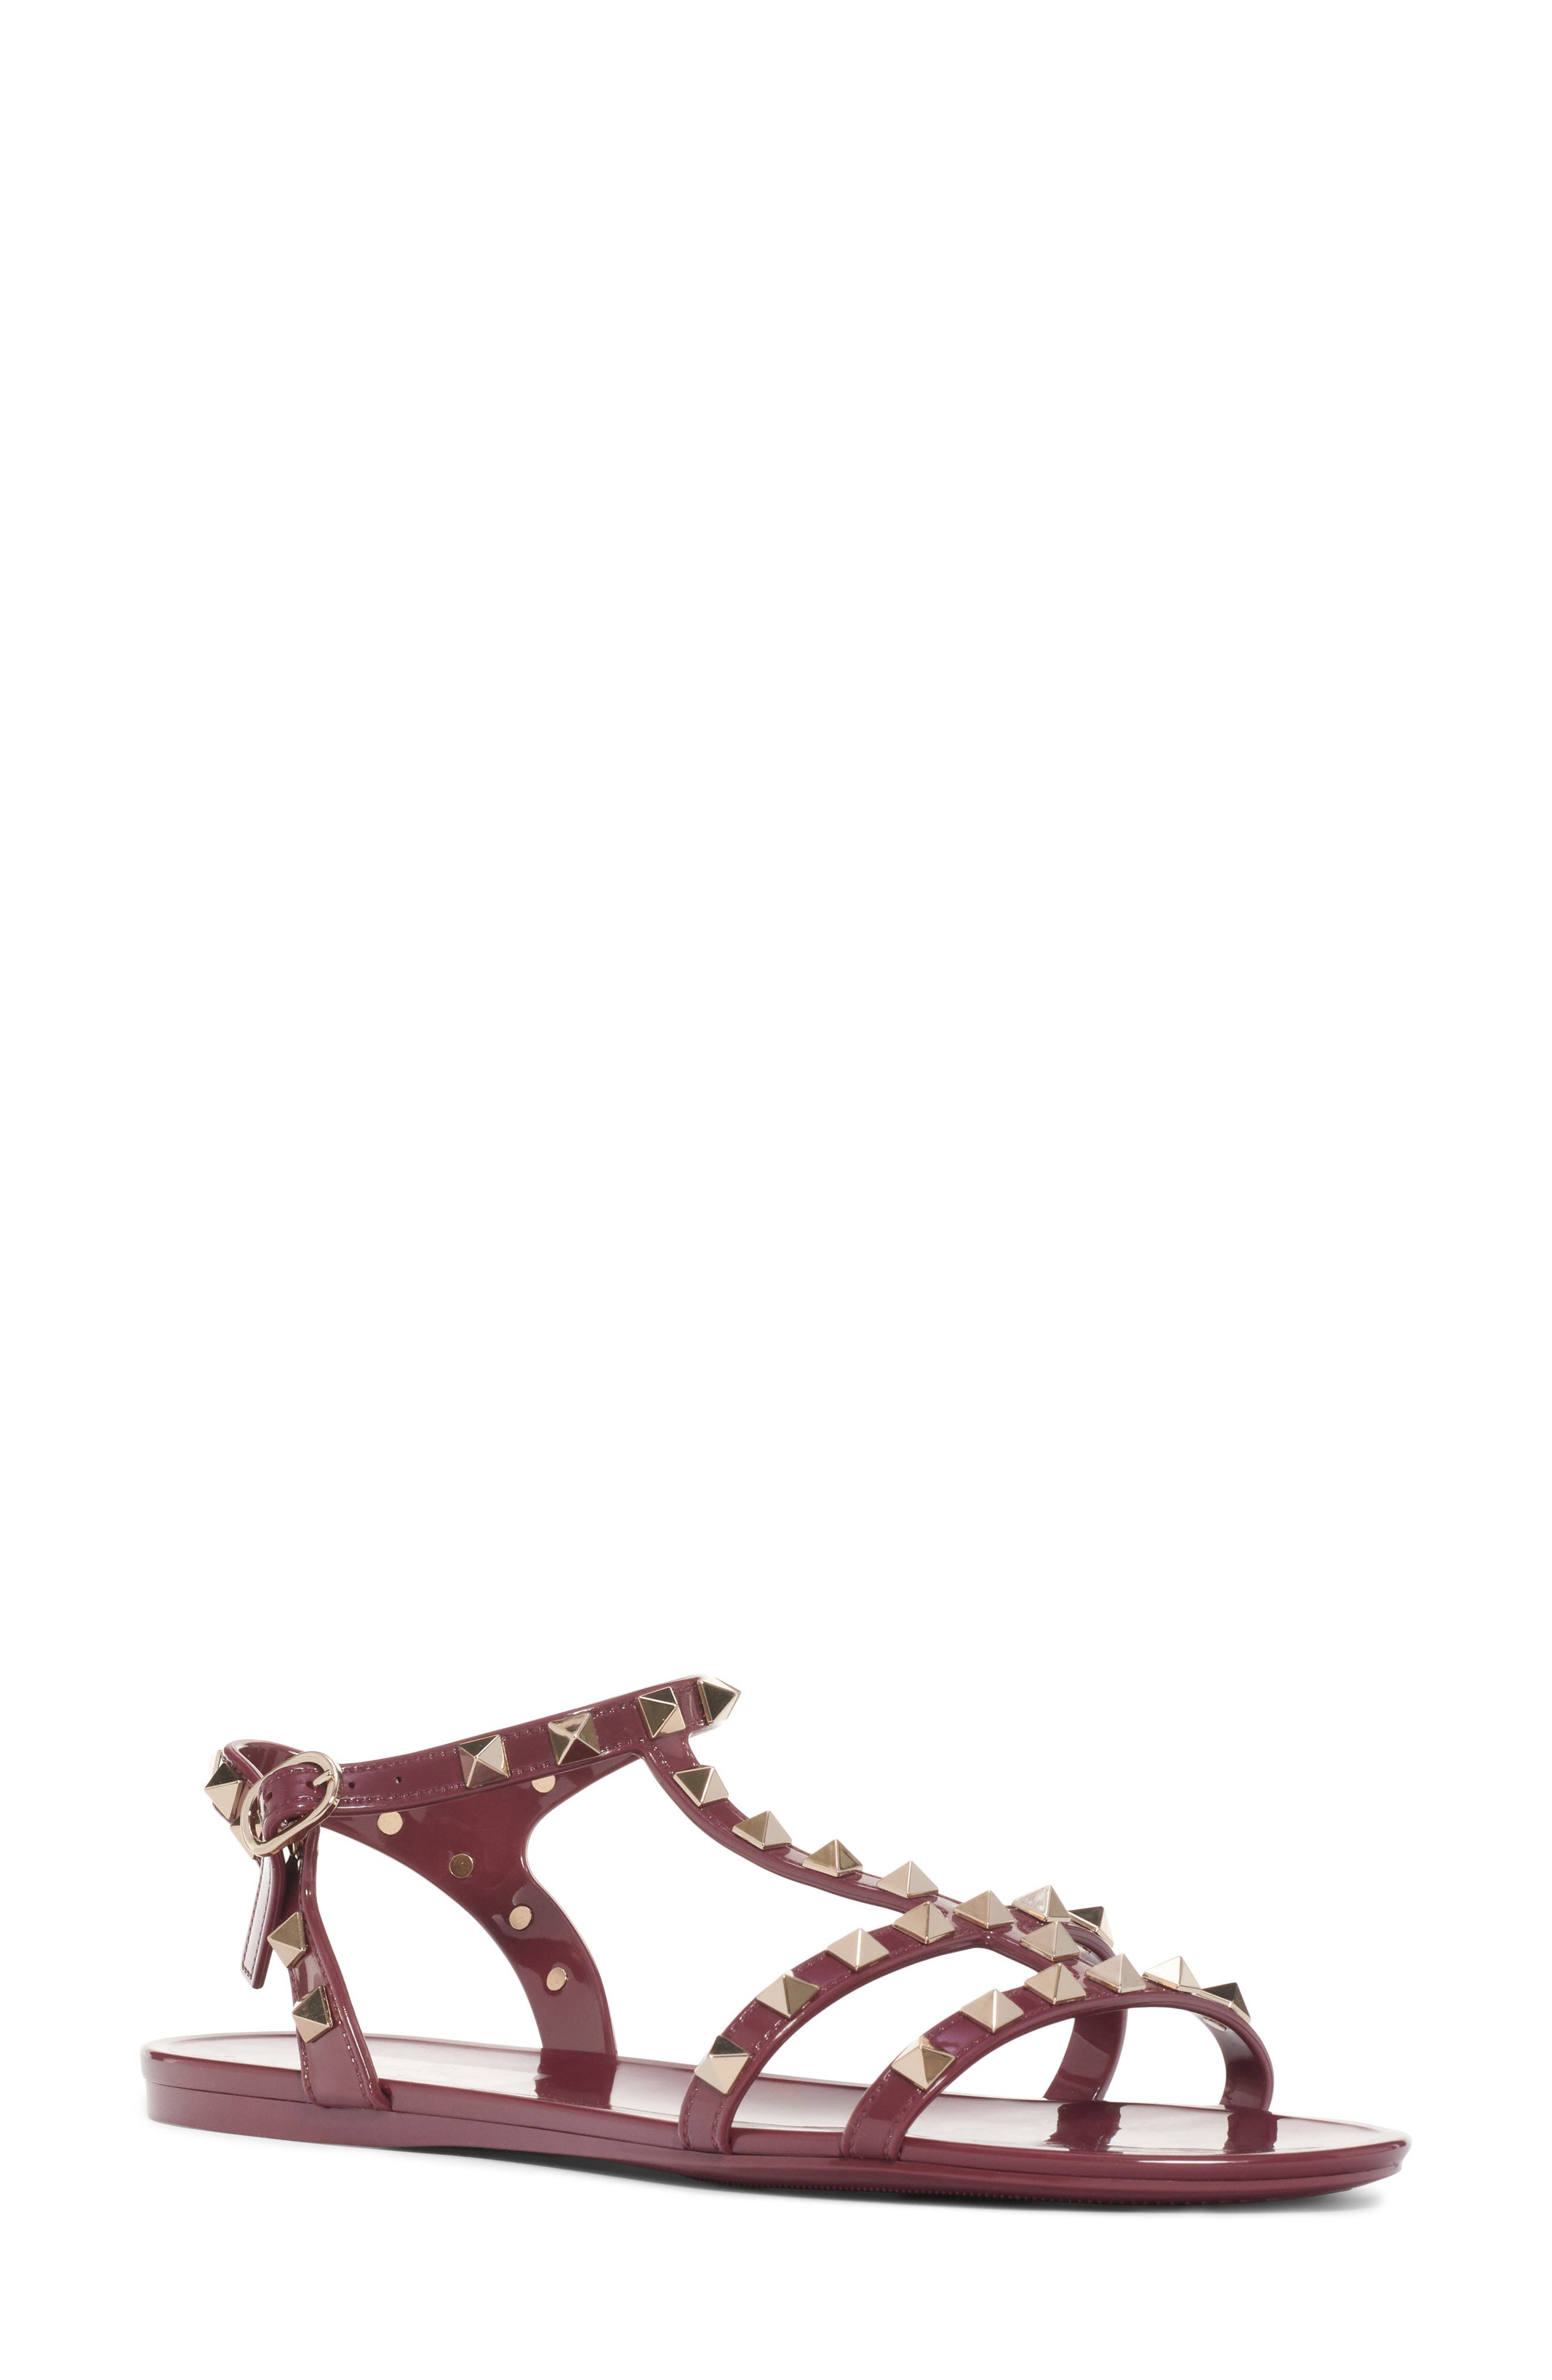 VALENTINO GARAVANI Rockstud Sandal (Women)